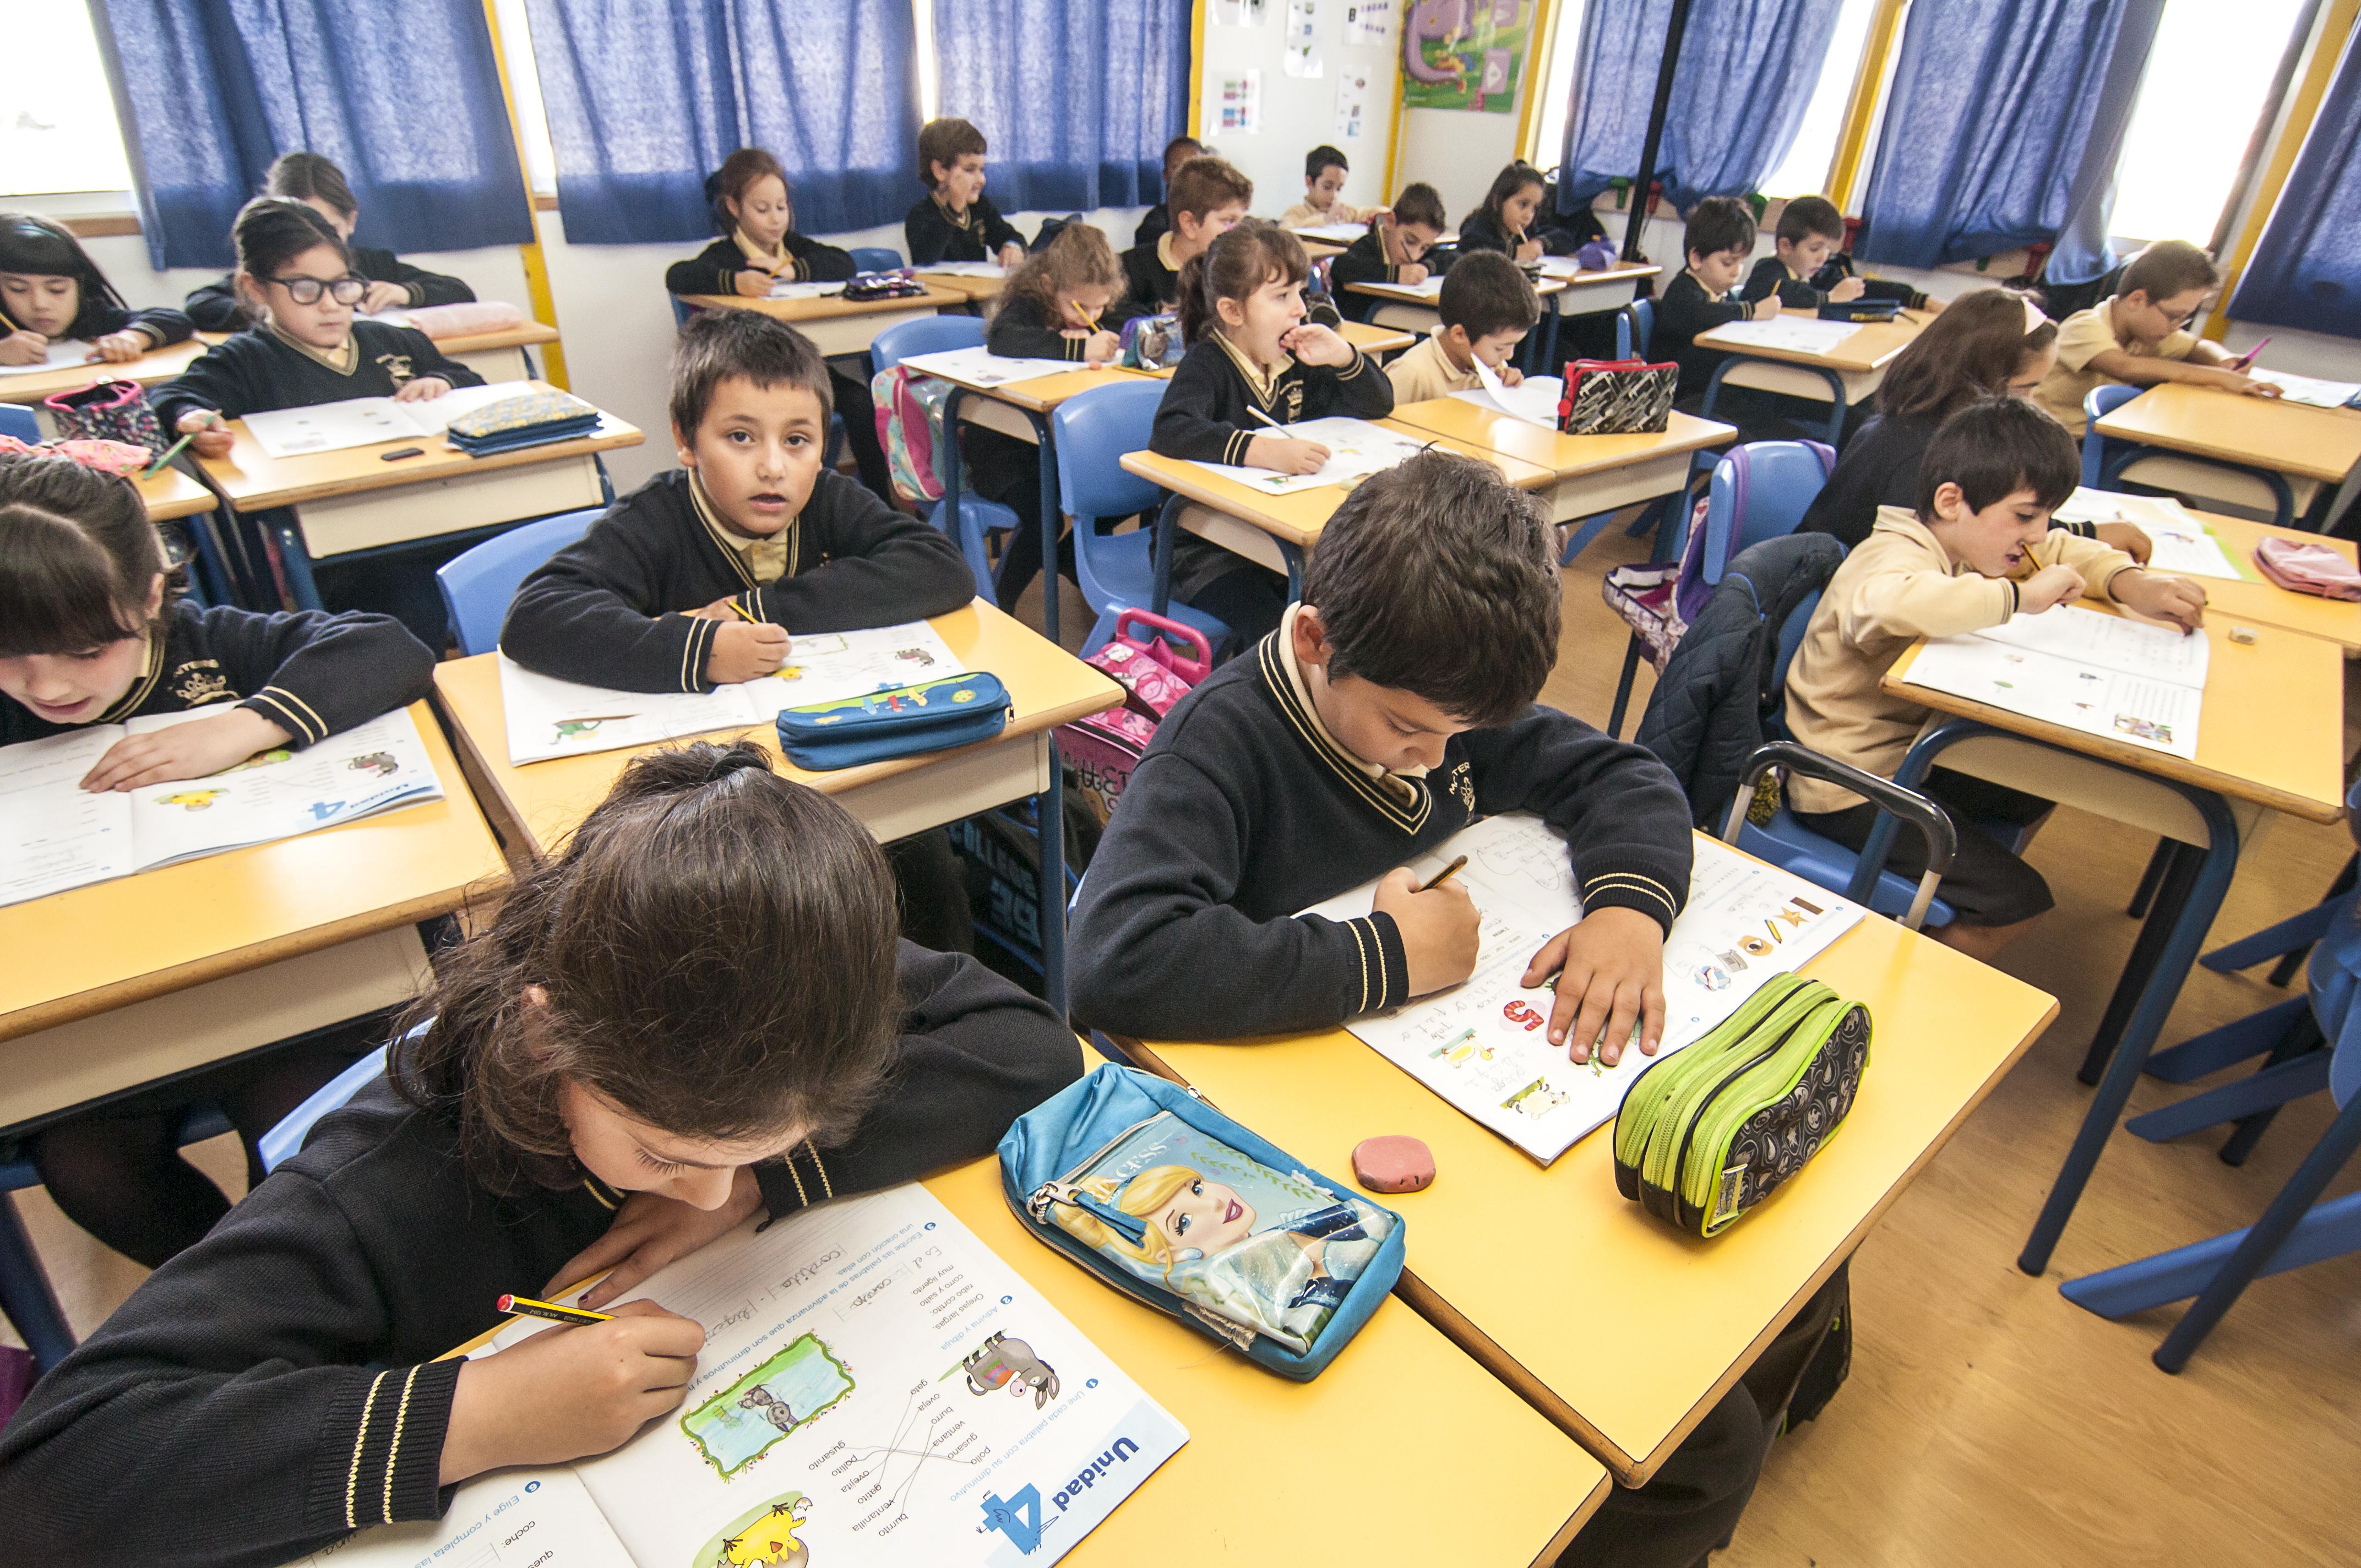 Cole14 colexio monterrey vigo - Colegio monterrey vigo ...